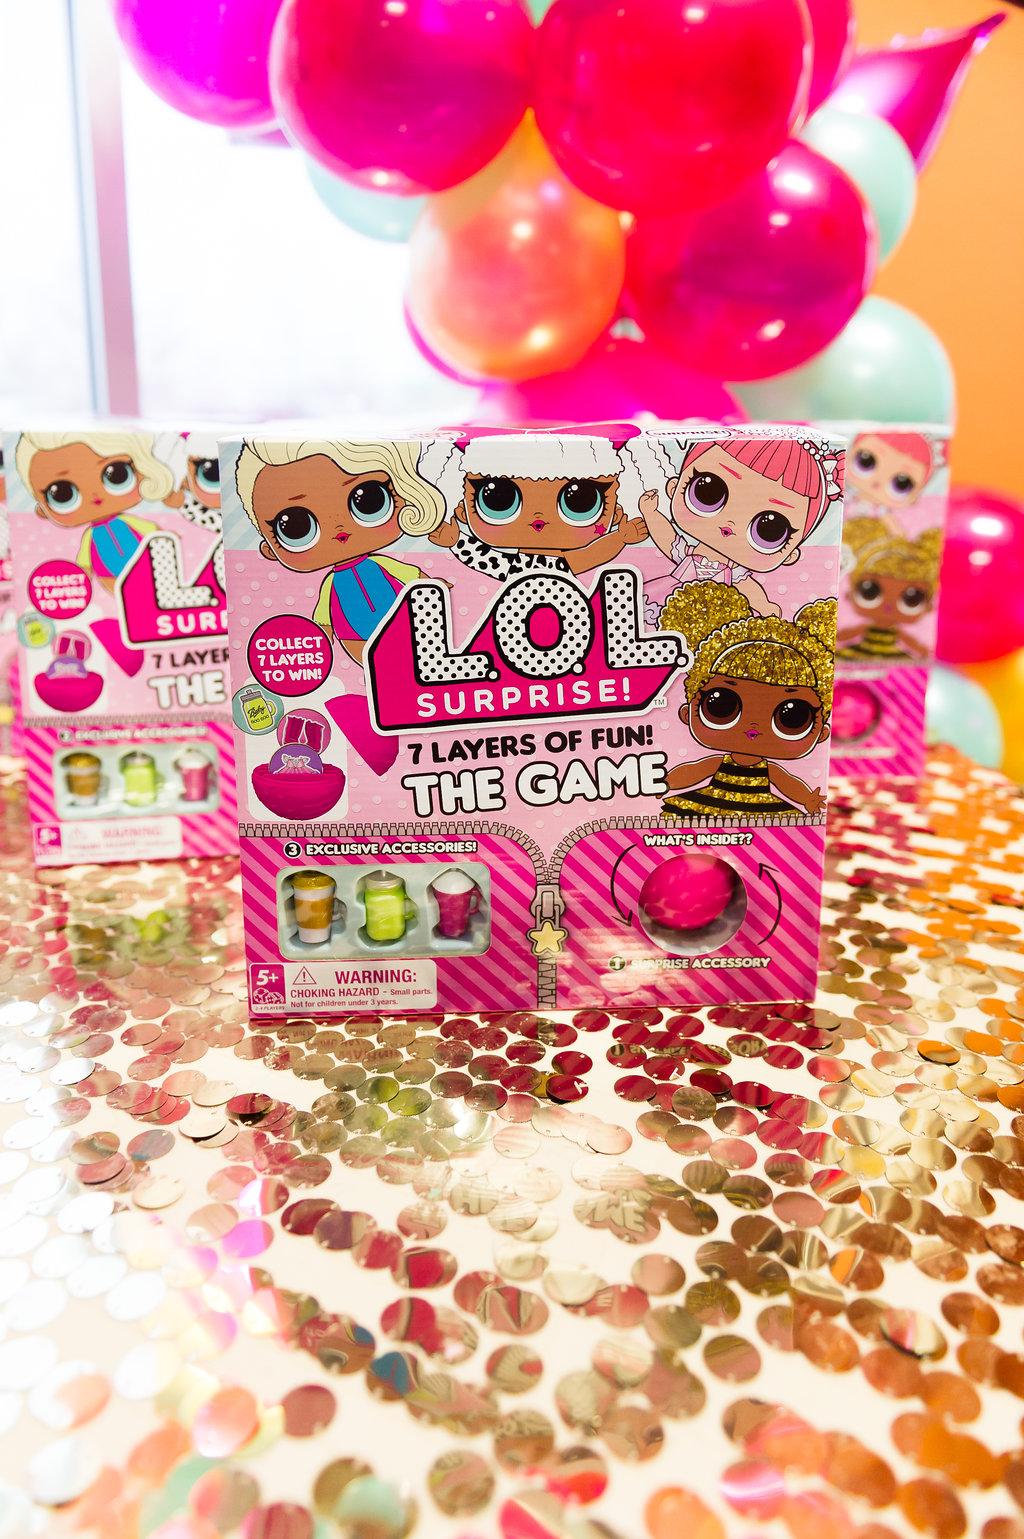 L.O.L. Surprise Doll Confetti Pop Party Chicago - Nicole Marie Events